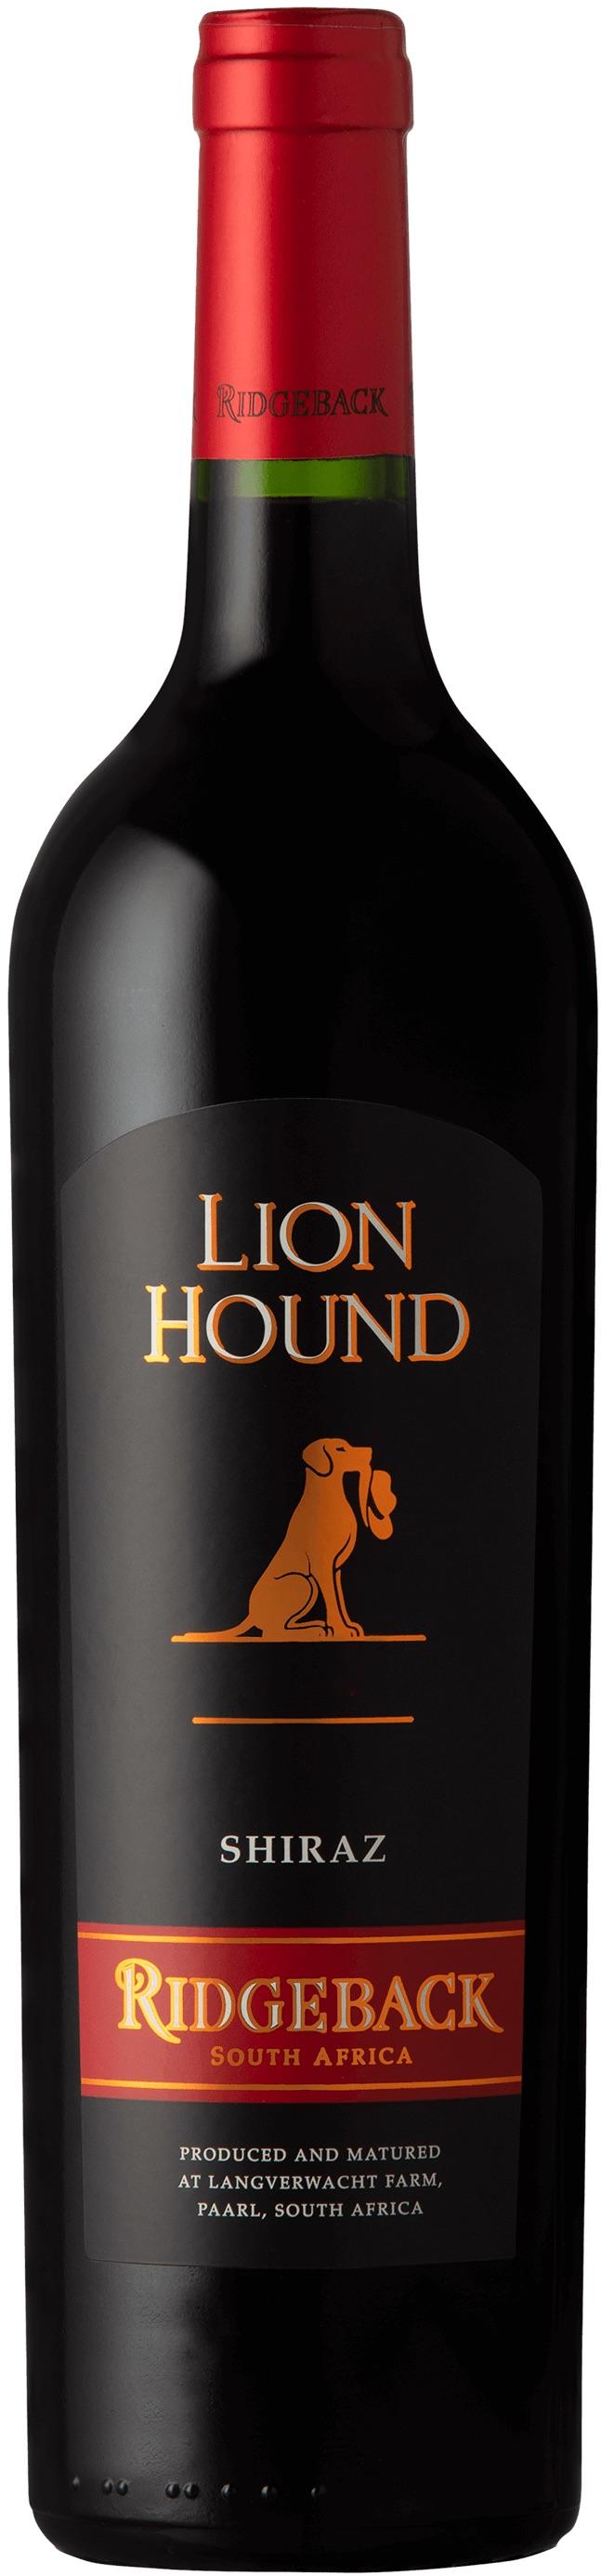 The Lion Hound Shiraz 2018